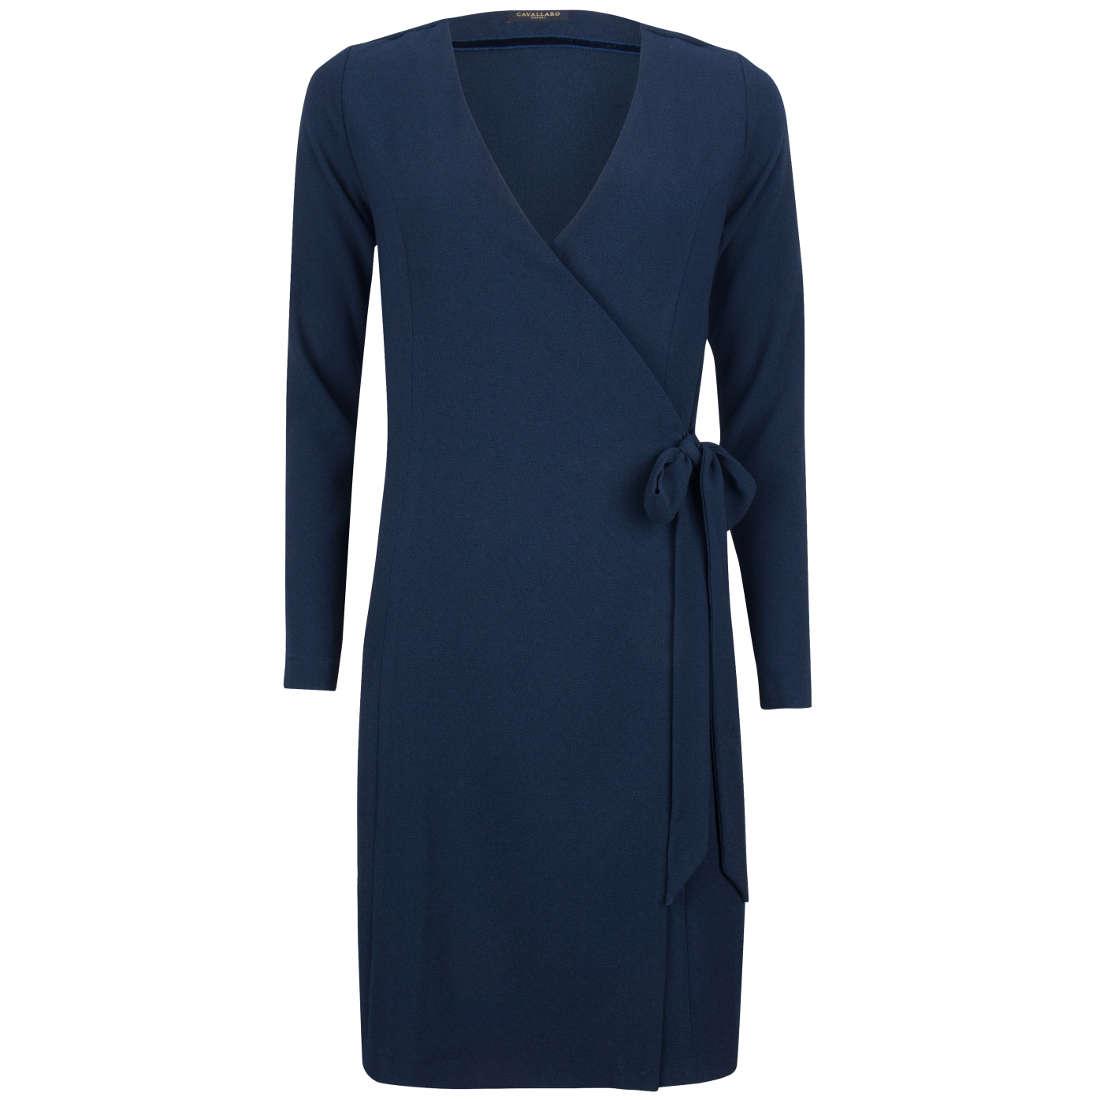 Cavallaro jurk 6385003 in het Donker Blauw